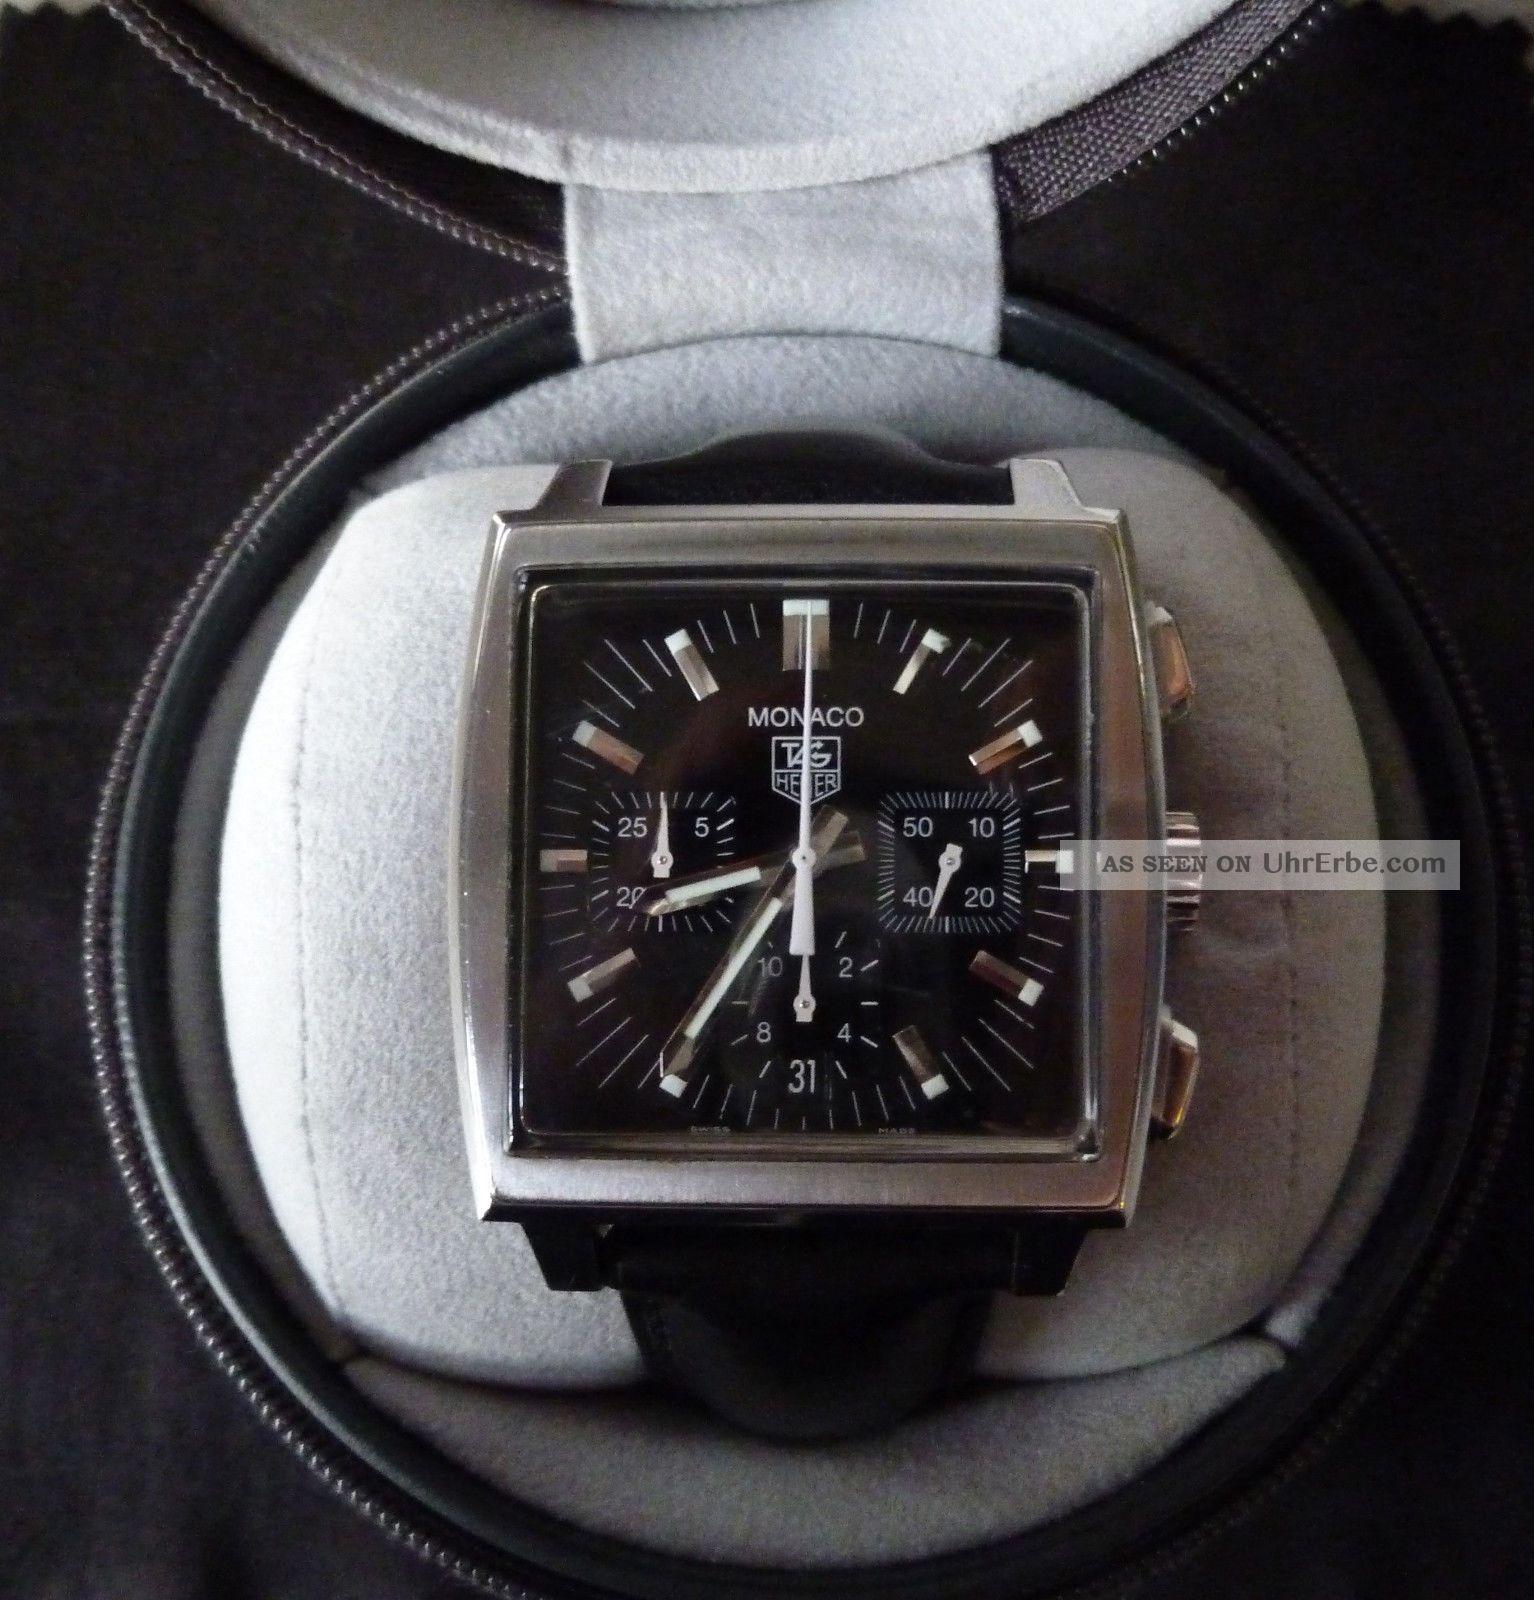 Tag Heuer Monaco Cw2111 - 0 Mit Box Und Garantiekarte Armbanduhren Bild